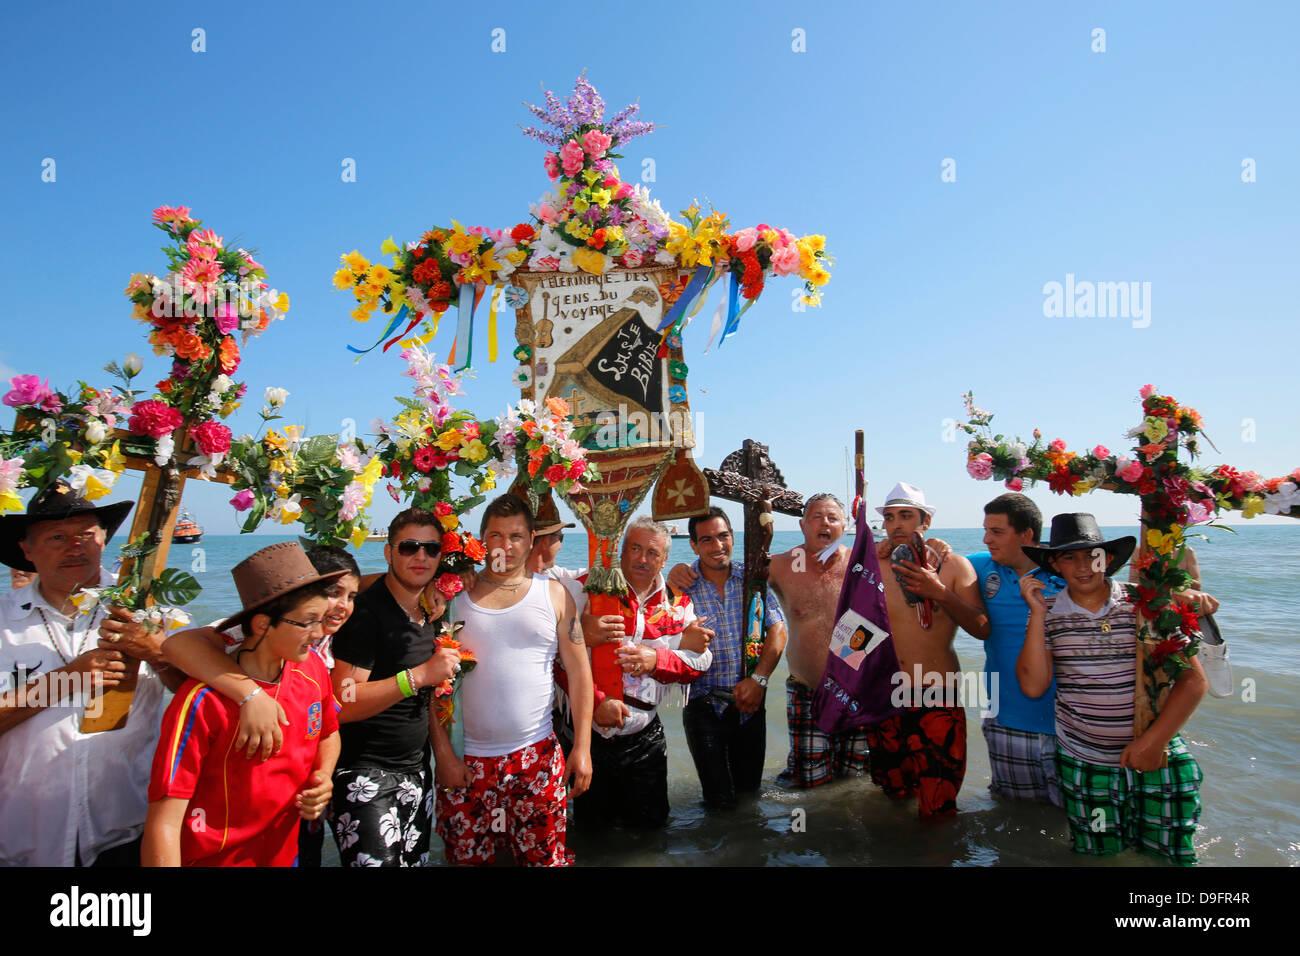 Gypsy pilgrimage at Les Saintes-Maries-de-la-Mer, Bouches-du-Rhone, France - Stock Image